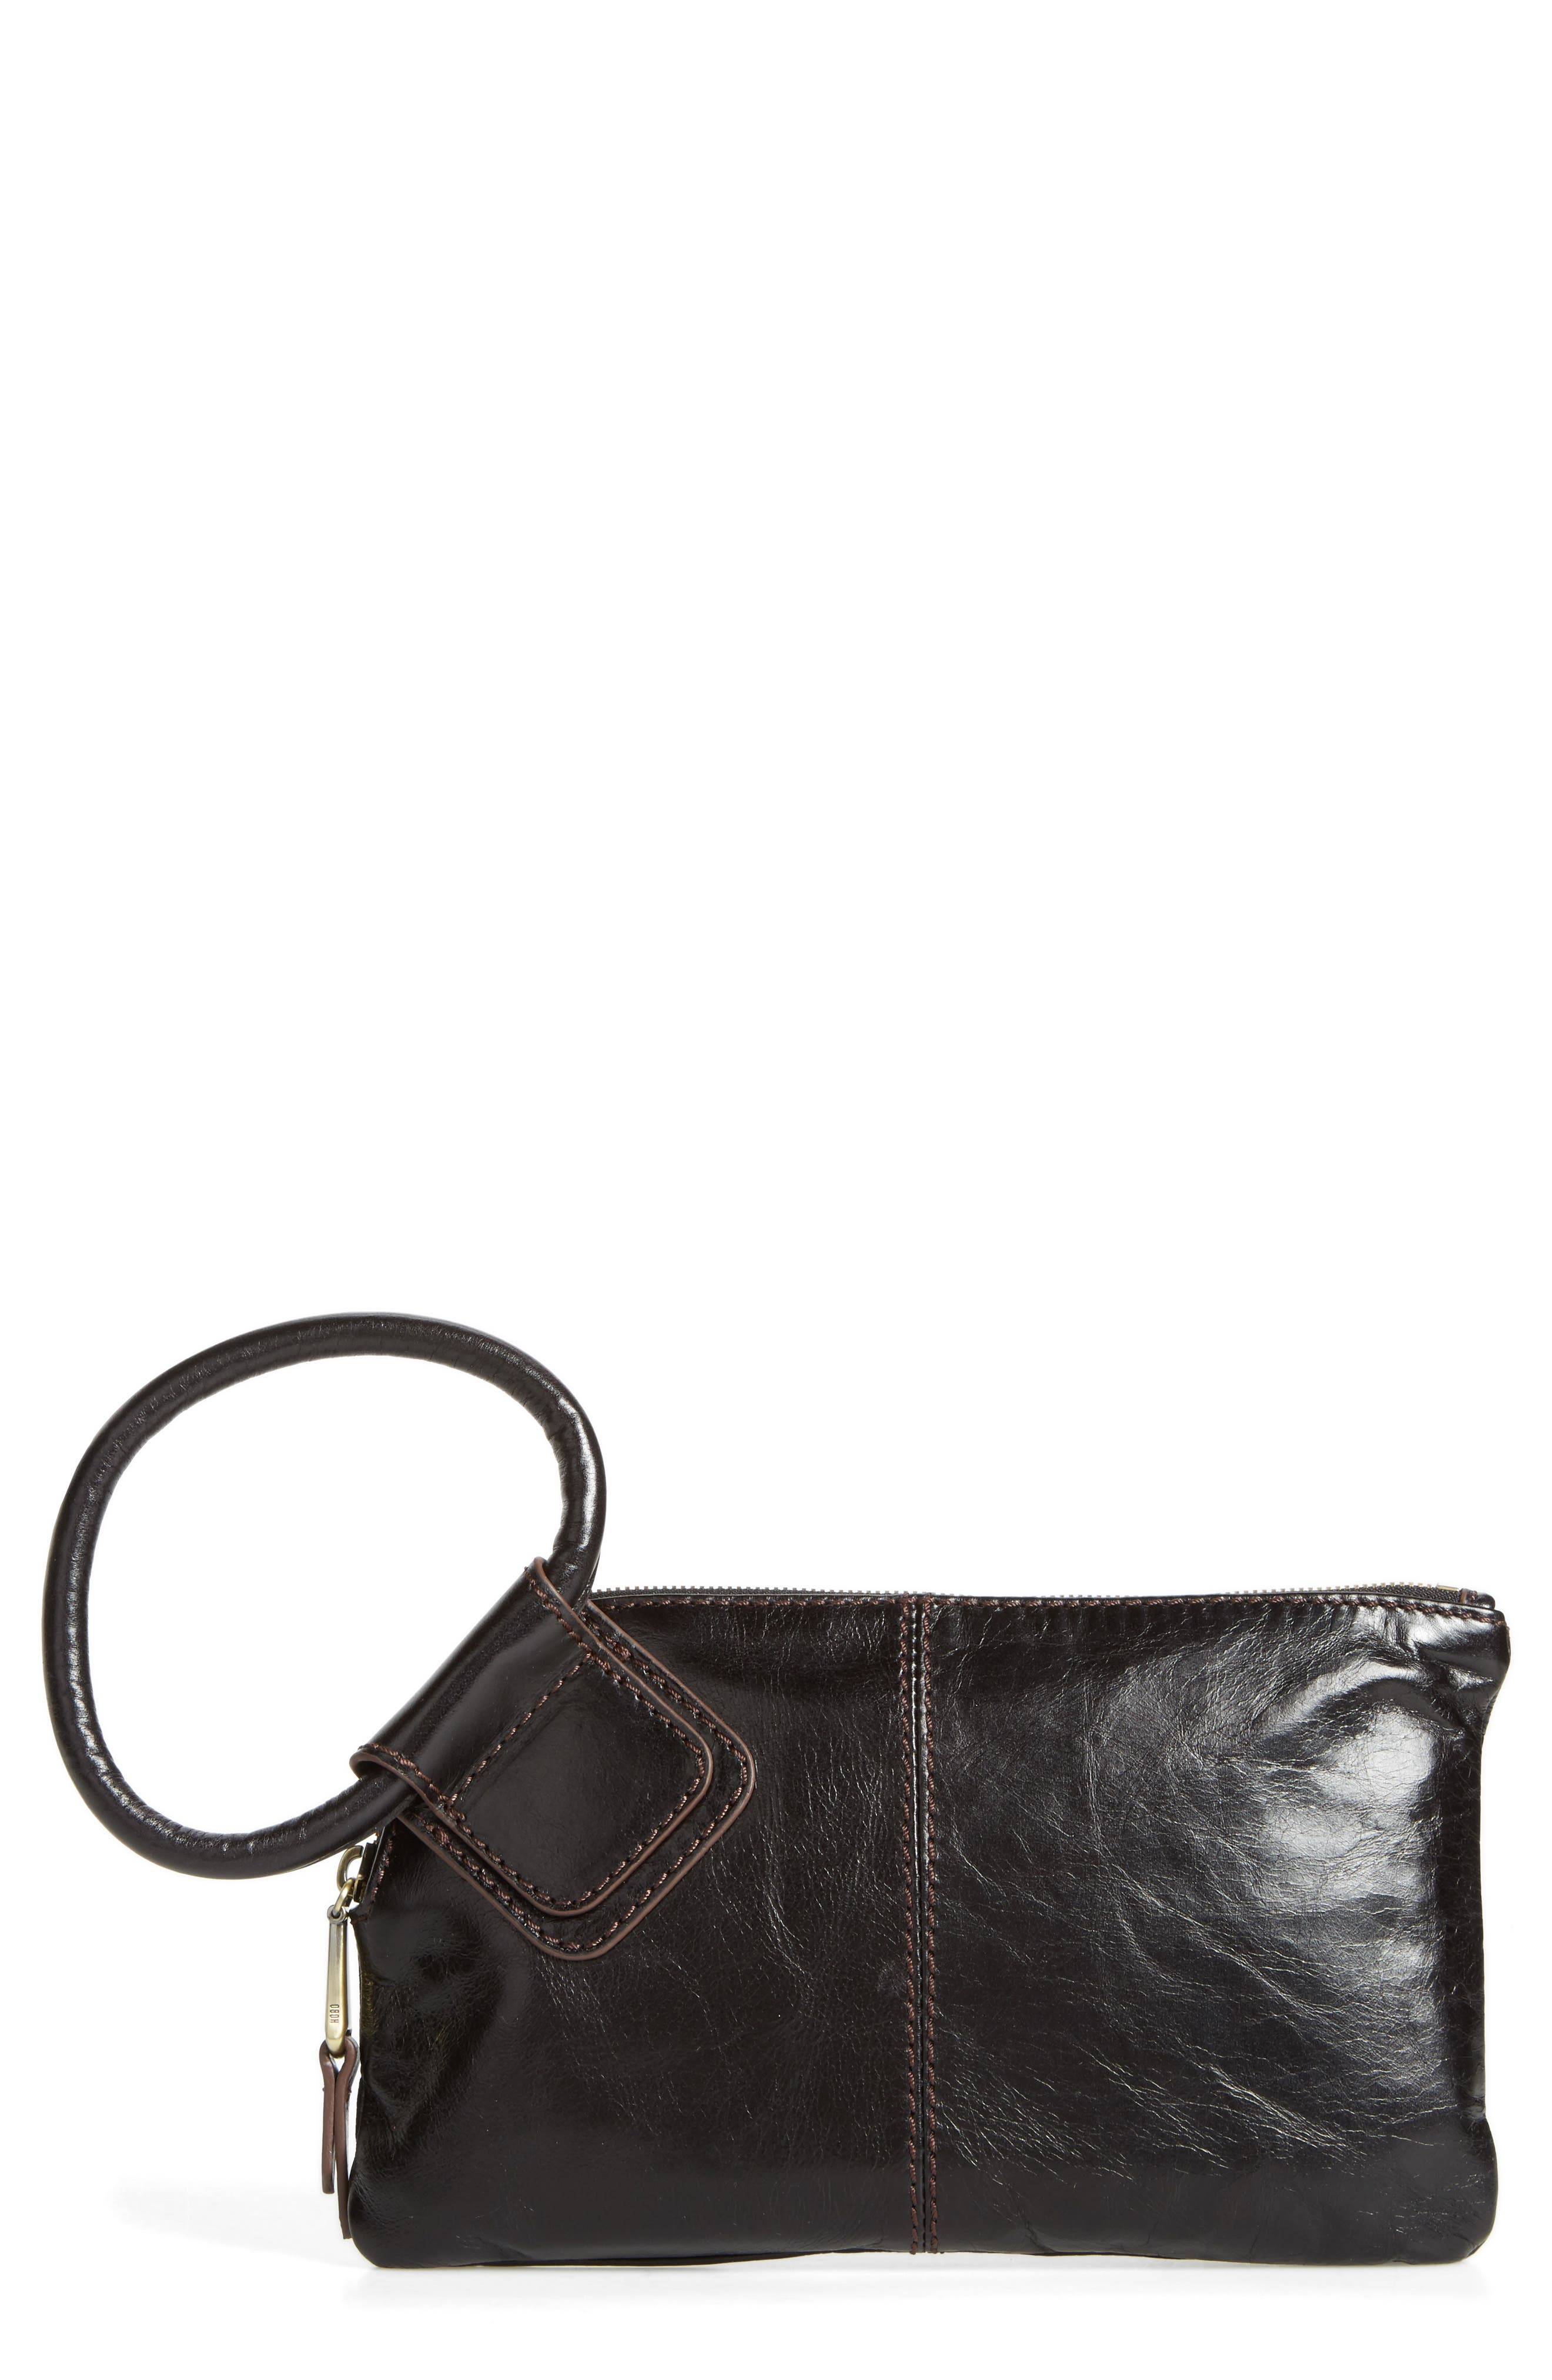 Main Image - Hobo Sable Calfskin Leather Clutch